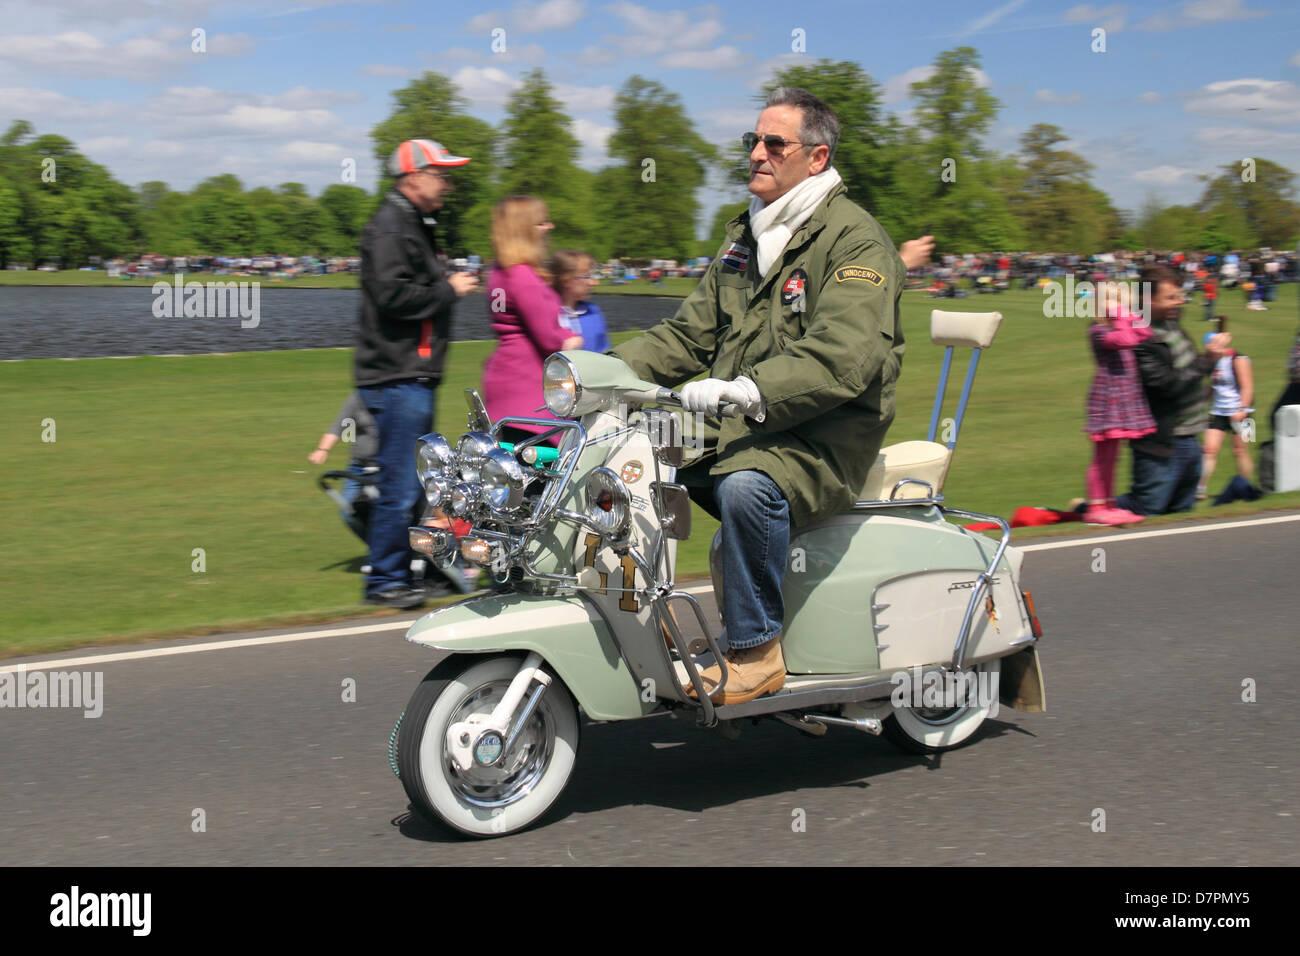 lambretta scooter in chestnut sonntag bushy park hampton court london uk